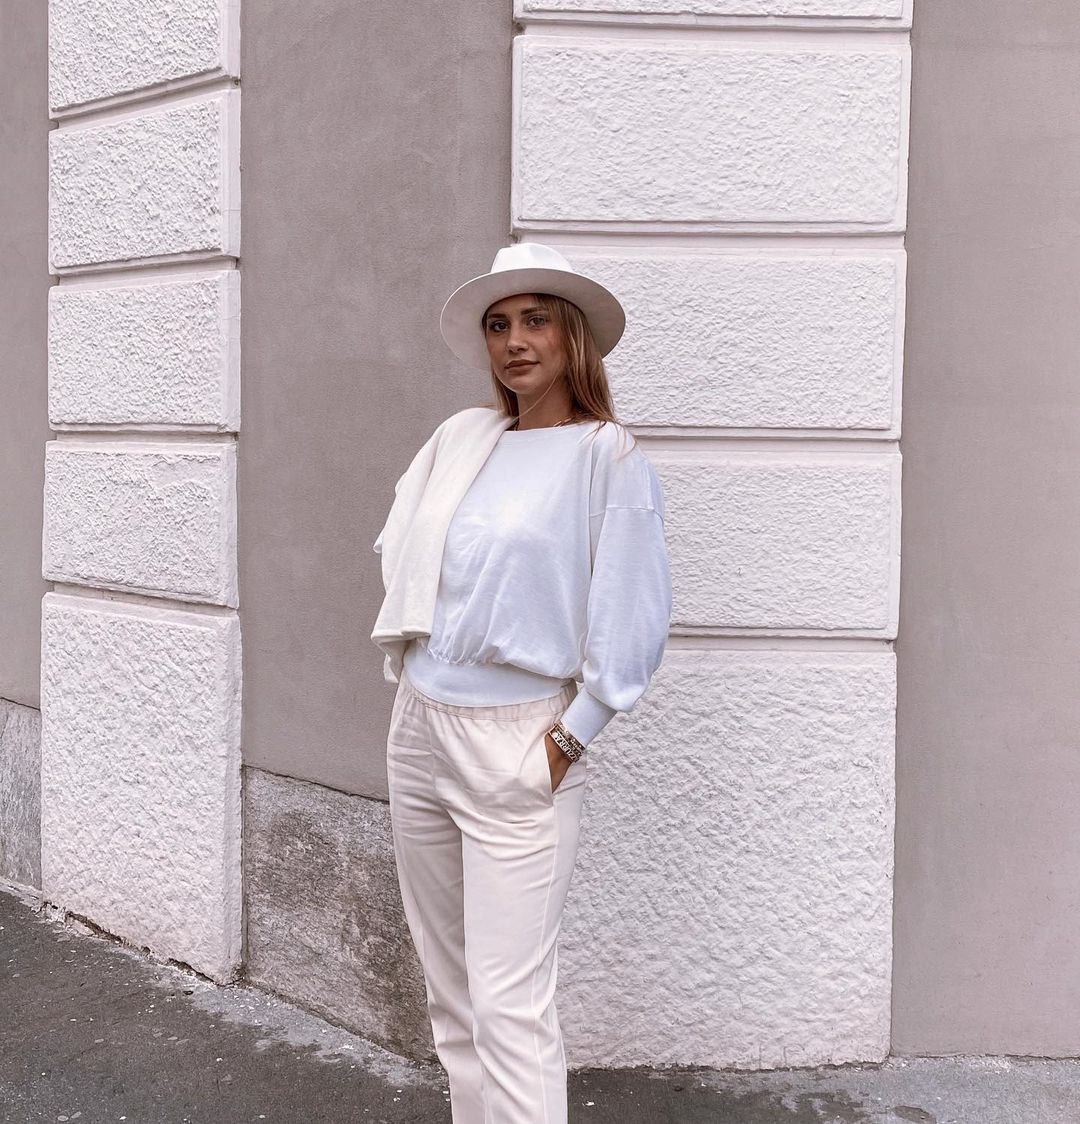 Beatrice-Valli-Wallpapers-Insta-Fit-Bio-5